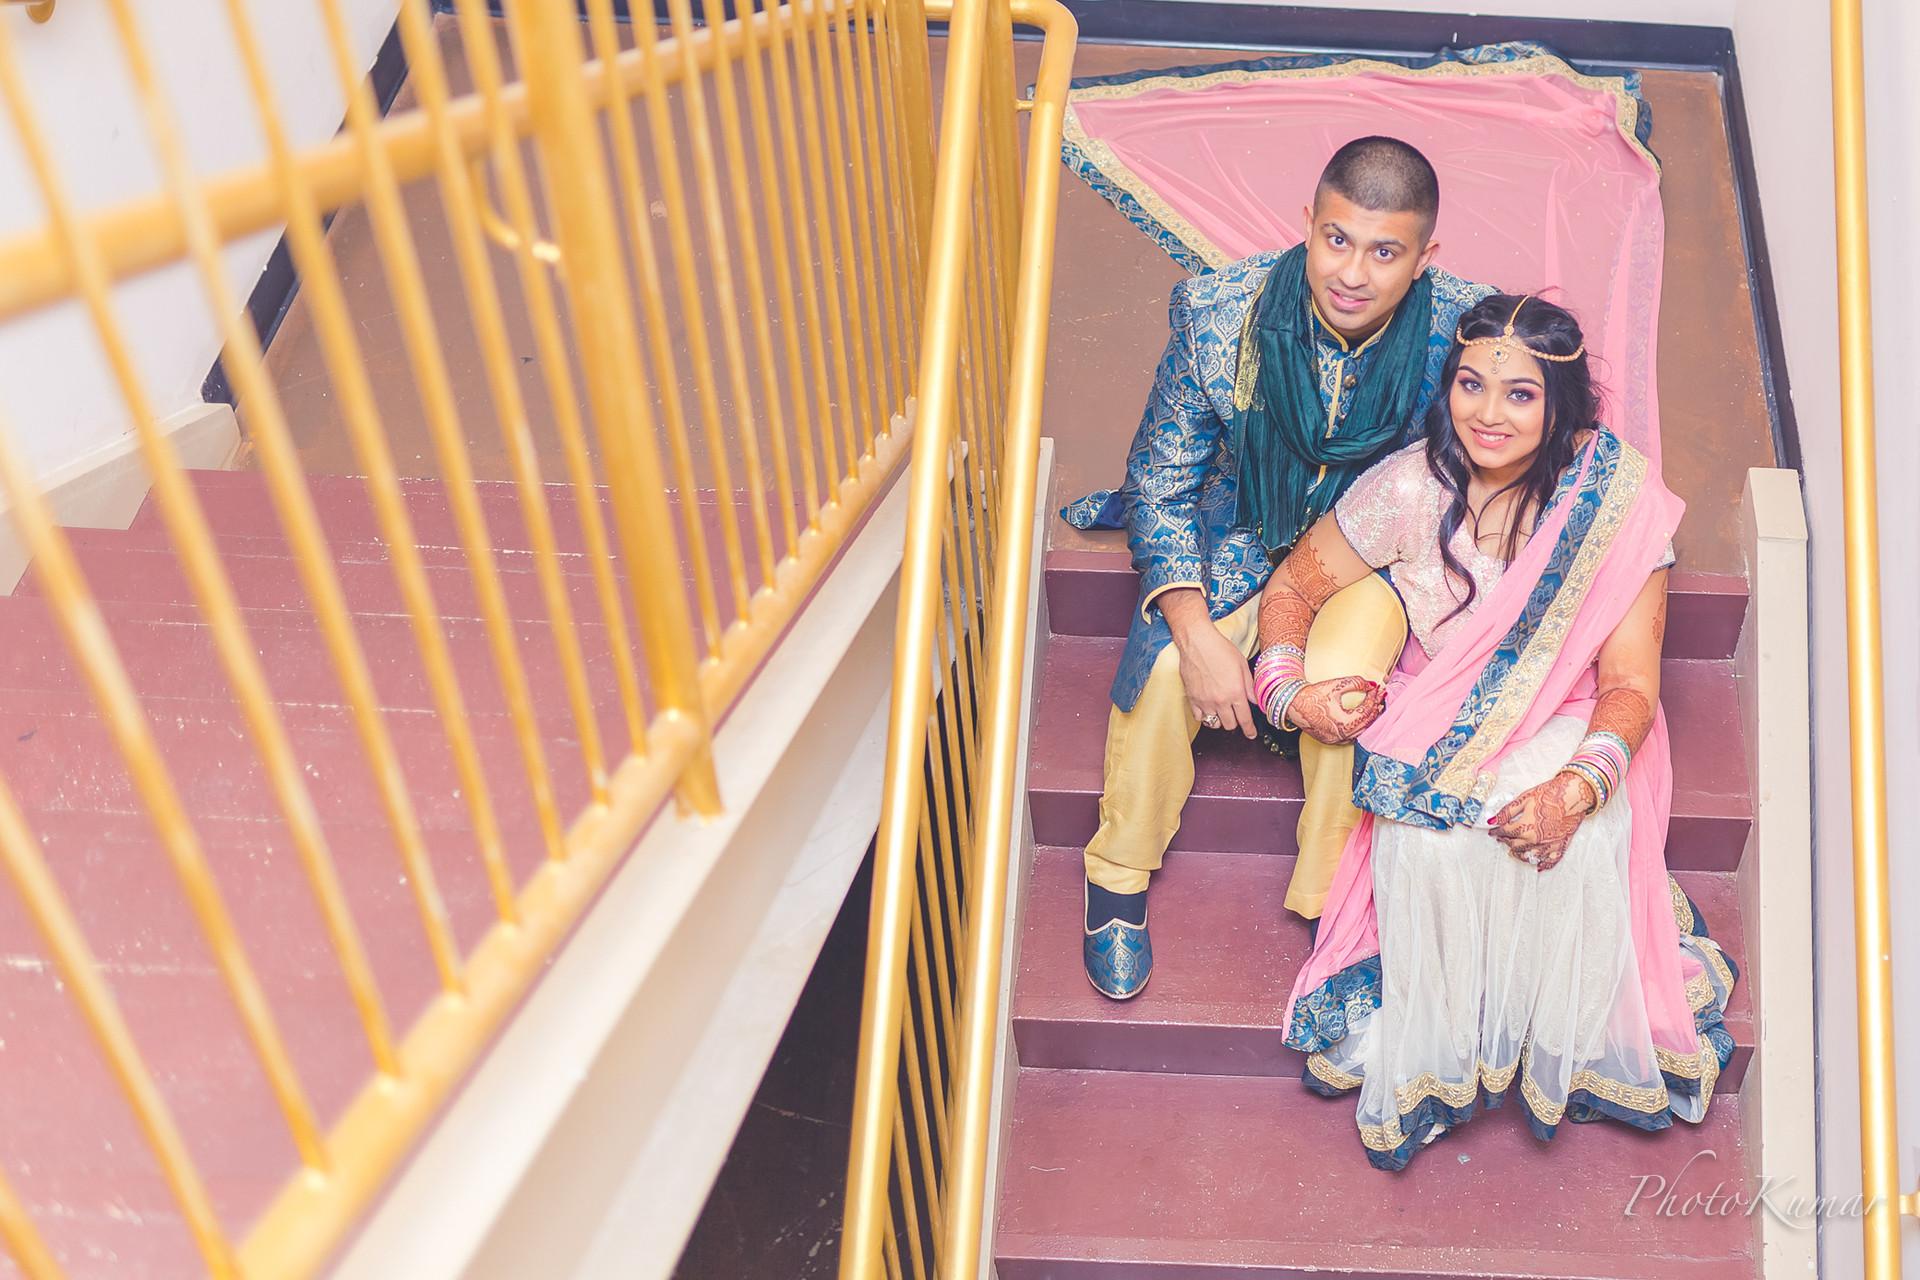 Photokumar-islamic-wedding-dallas-fort-worth-2018-9.jpg